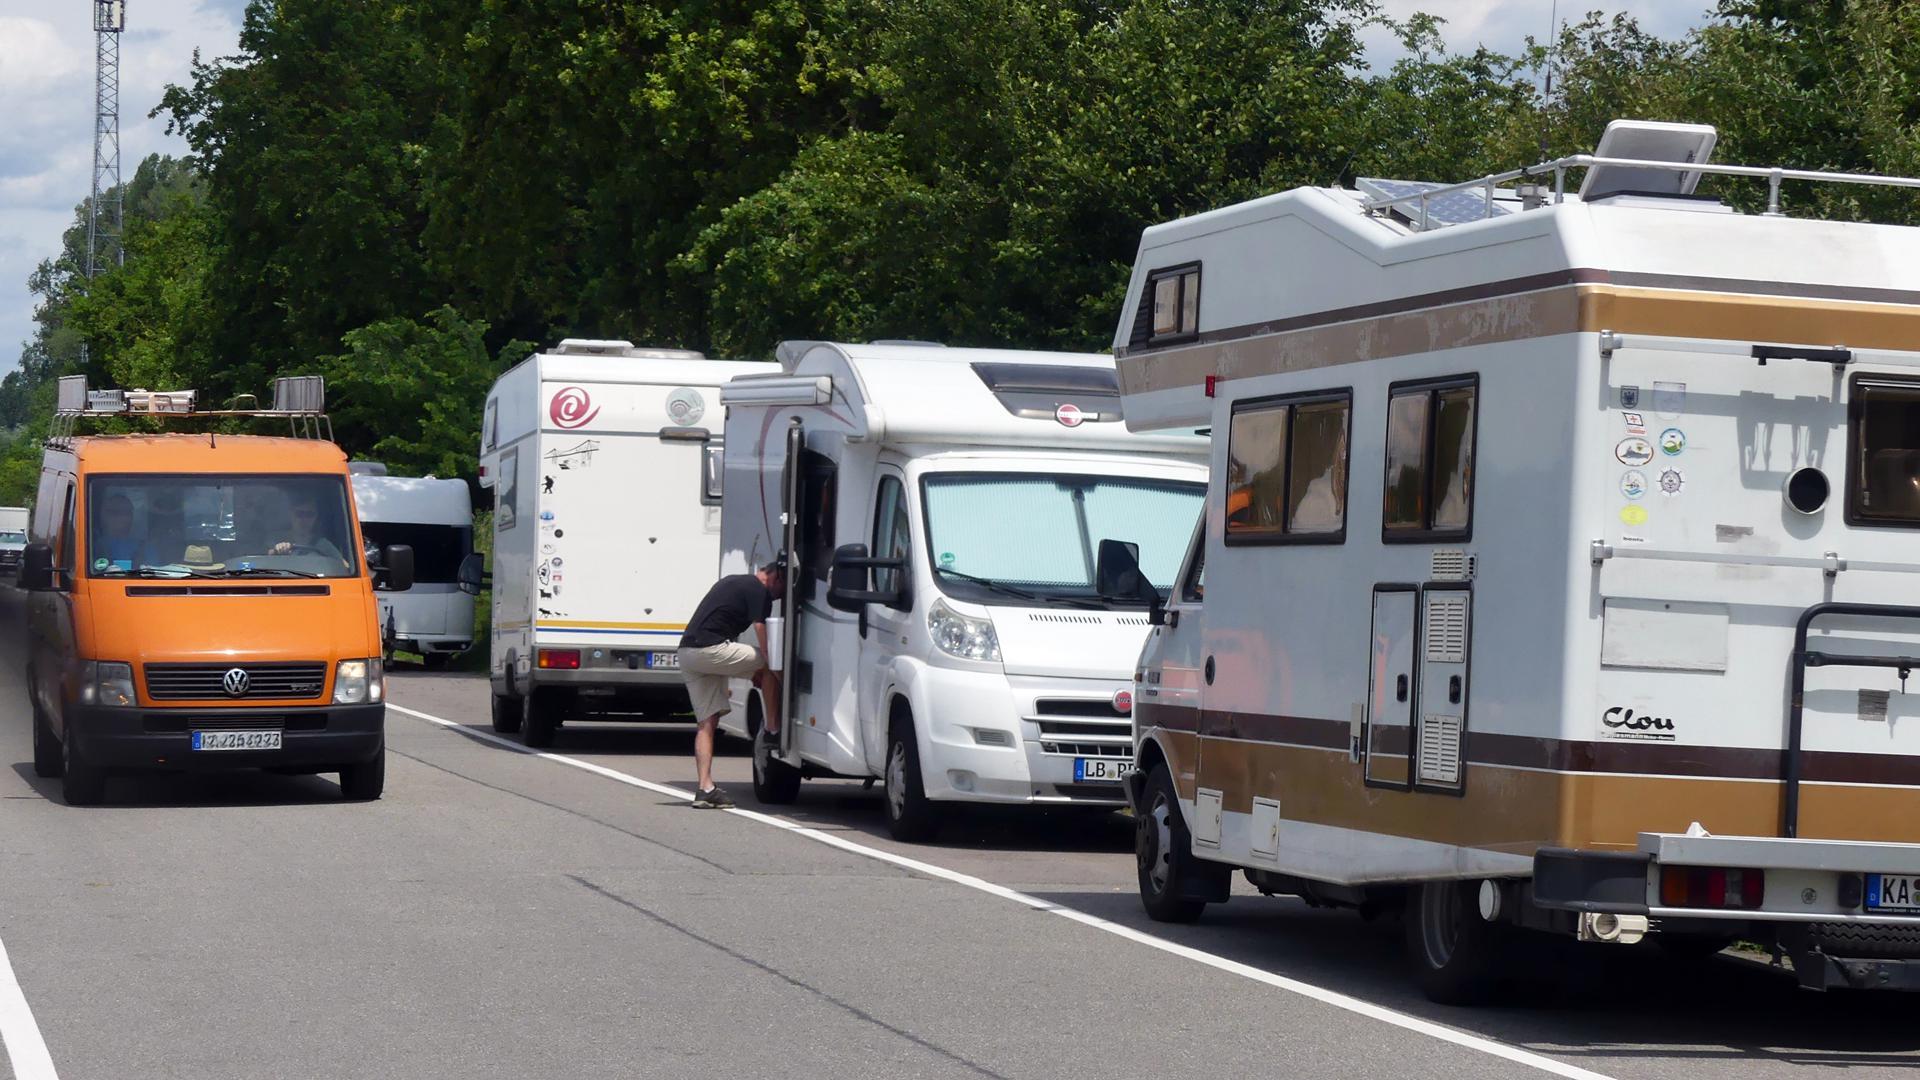 Camping Fähre